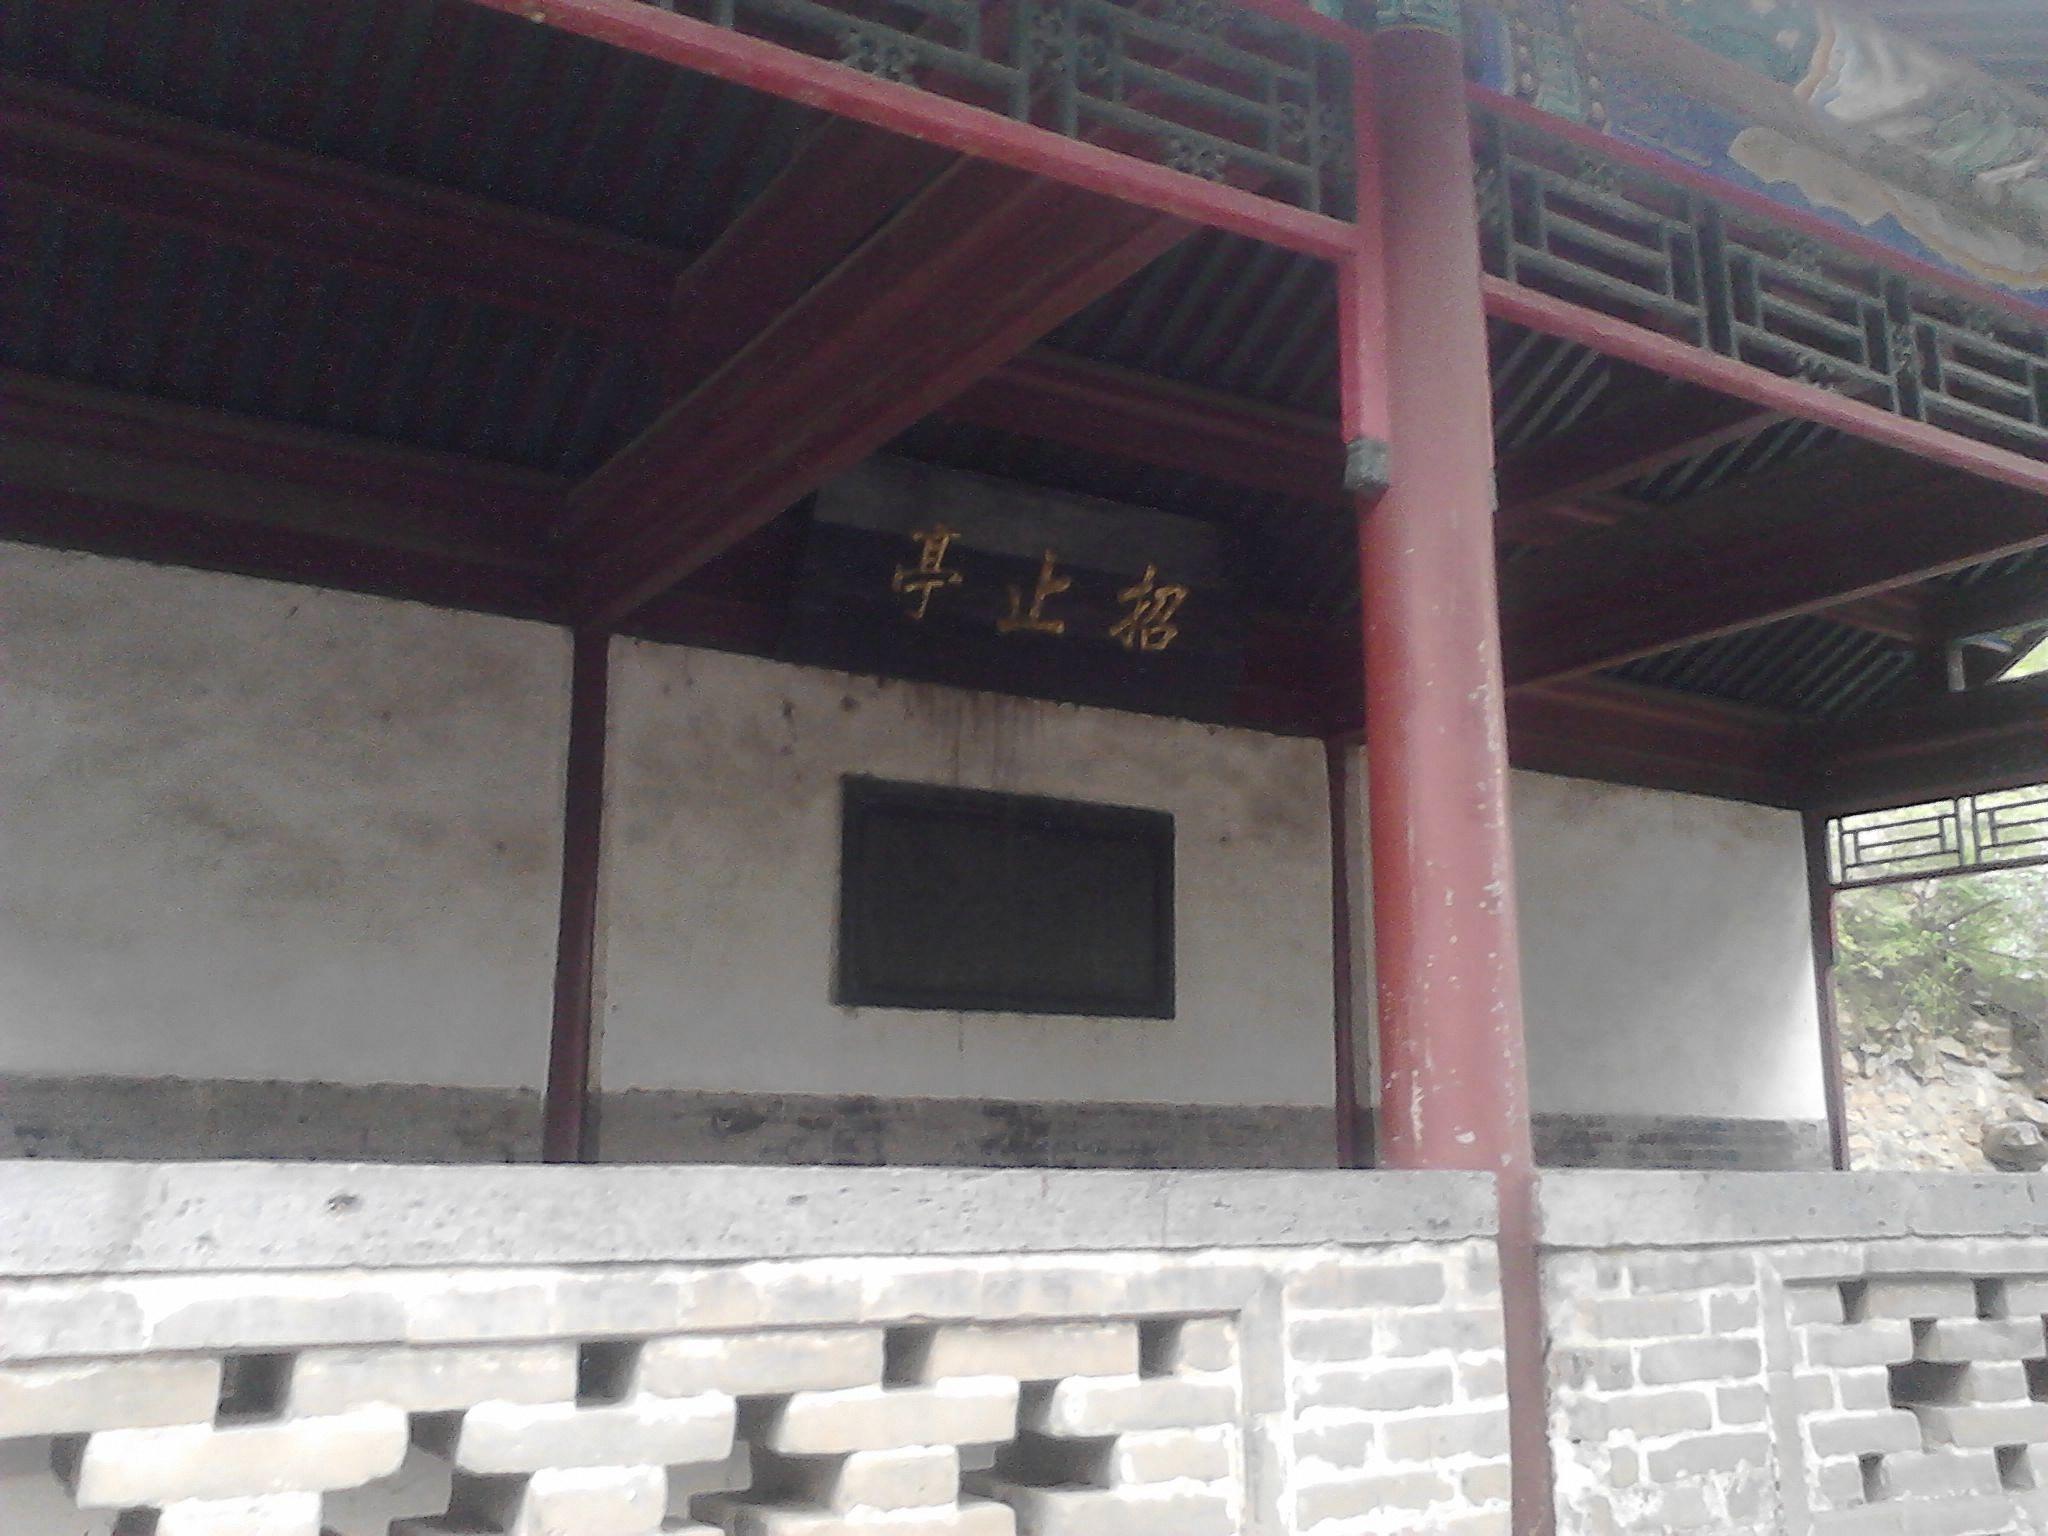 jugzhizhaopavilion1802540oftale9573430062phot.jpg